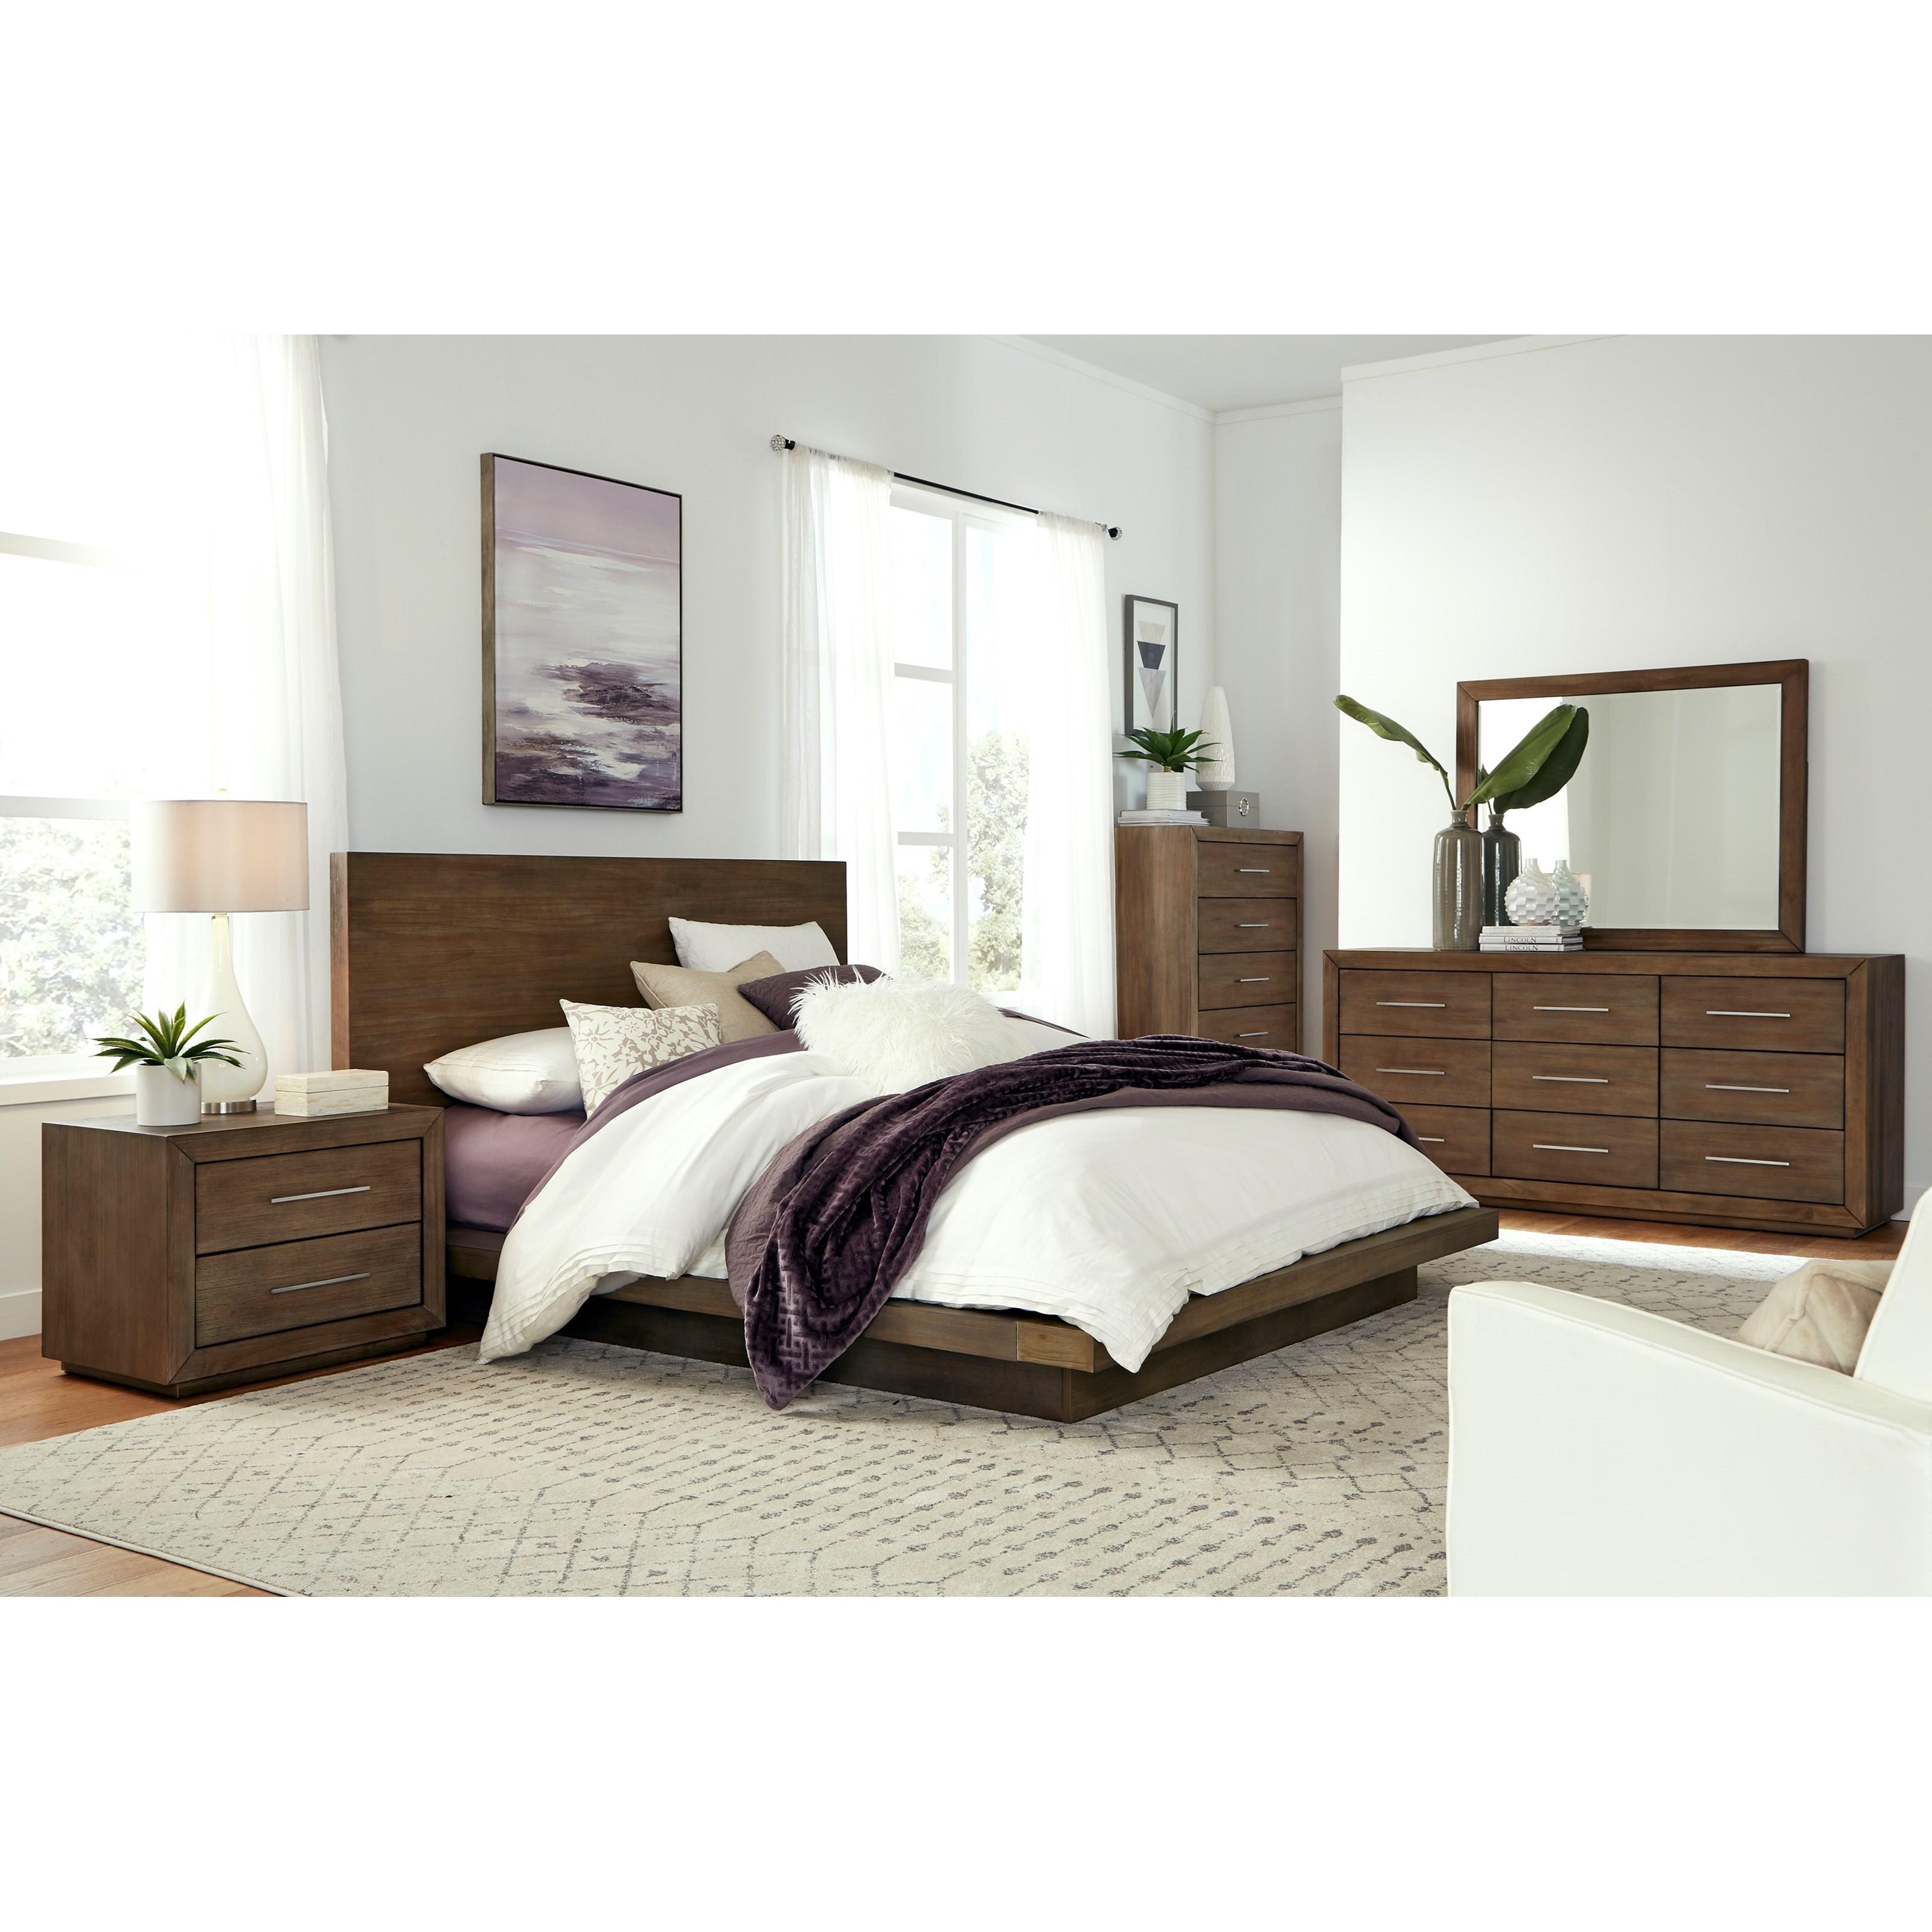 Melbourne Full Bedroom Group at Sadler's Home Furnishings